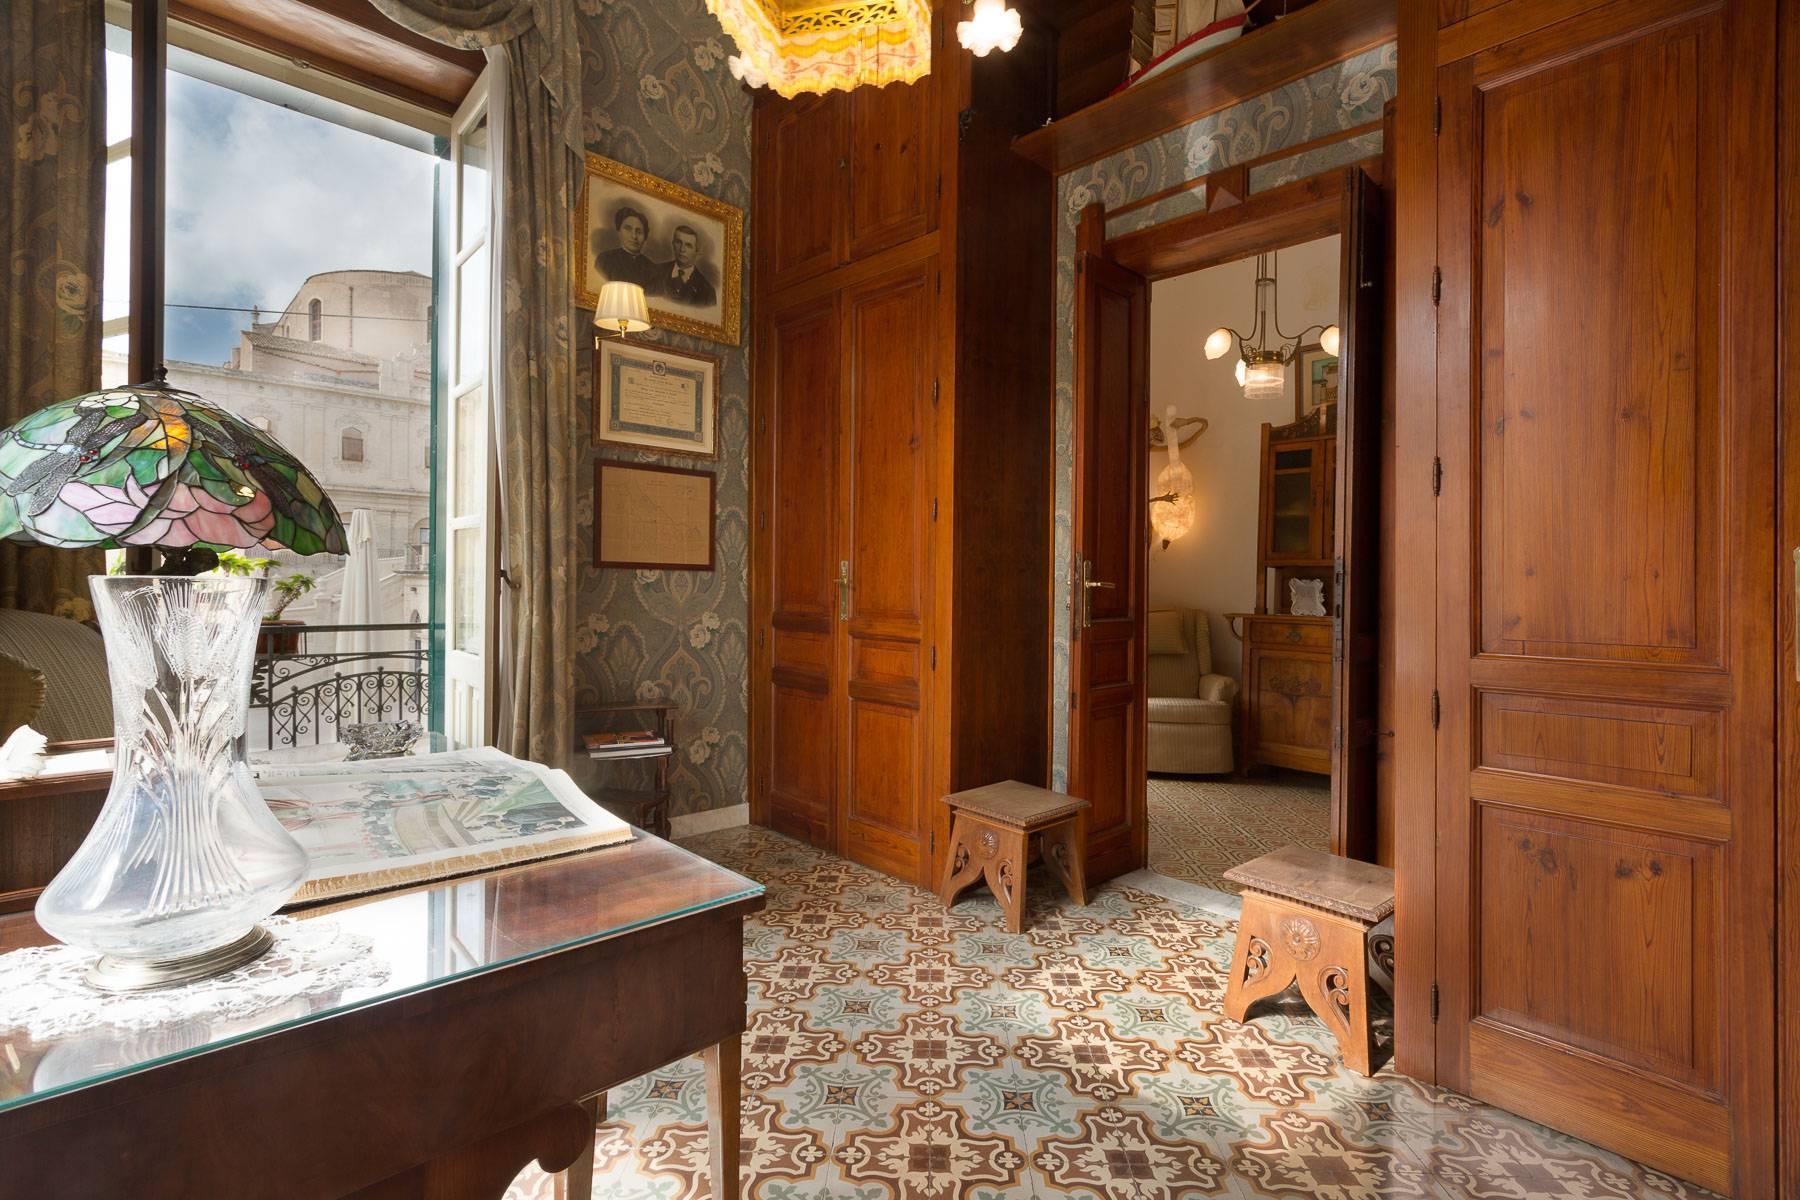 Casa indipendente in Vendita a Noto: 5 locali, 280 mq - Foto 27